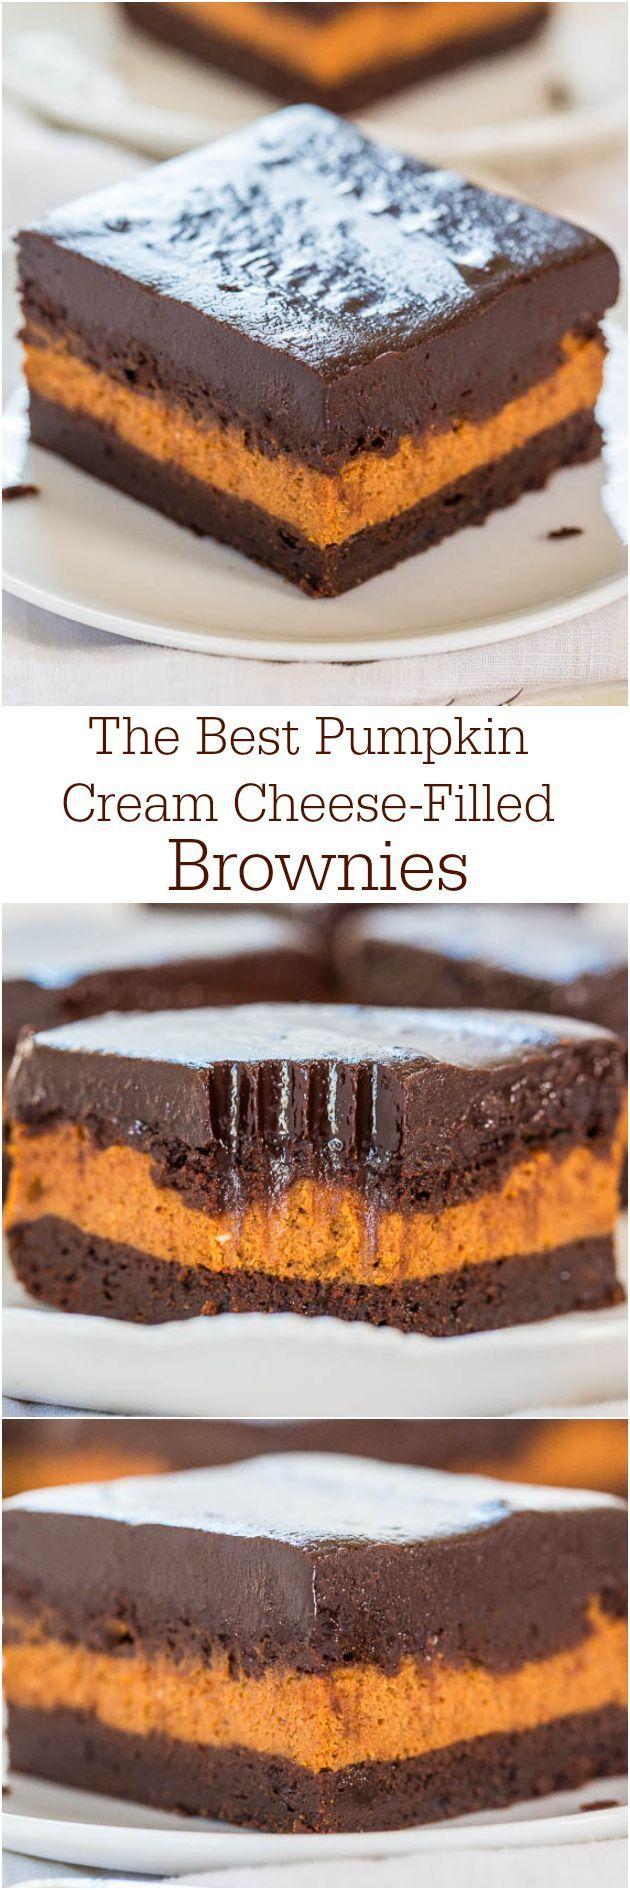 Pumpkin Cream Cheese-Filled Brownies - A layer of pumpkin cheesecake inside fudgy brownies